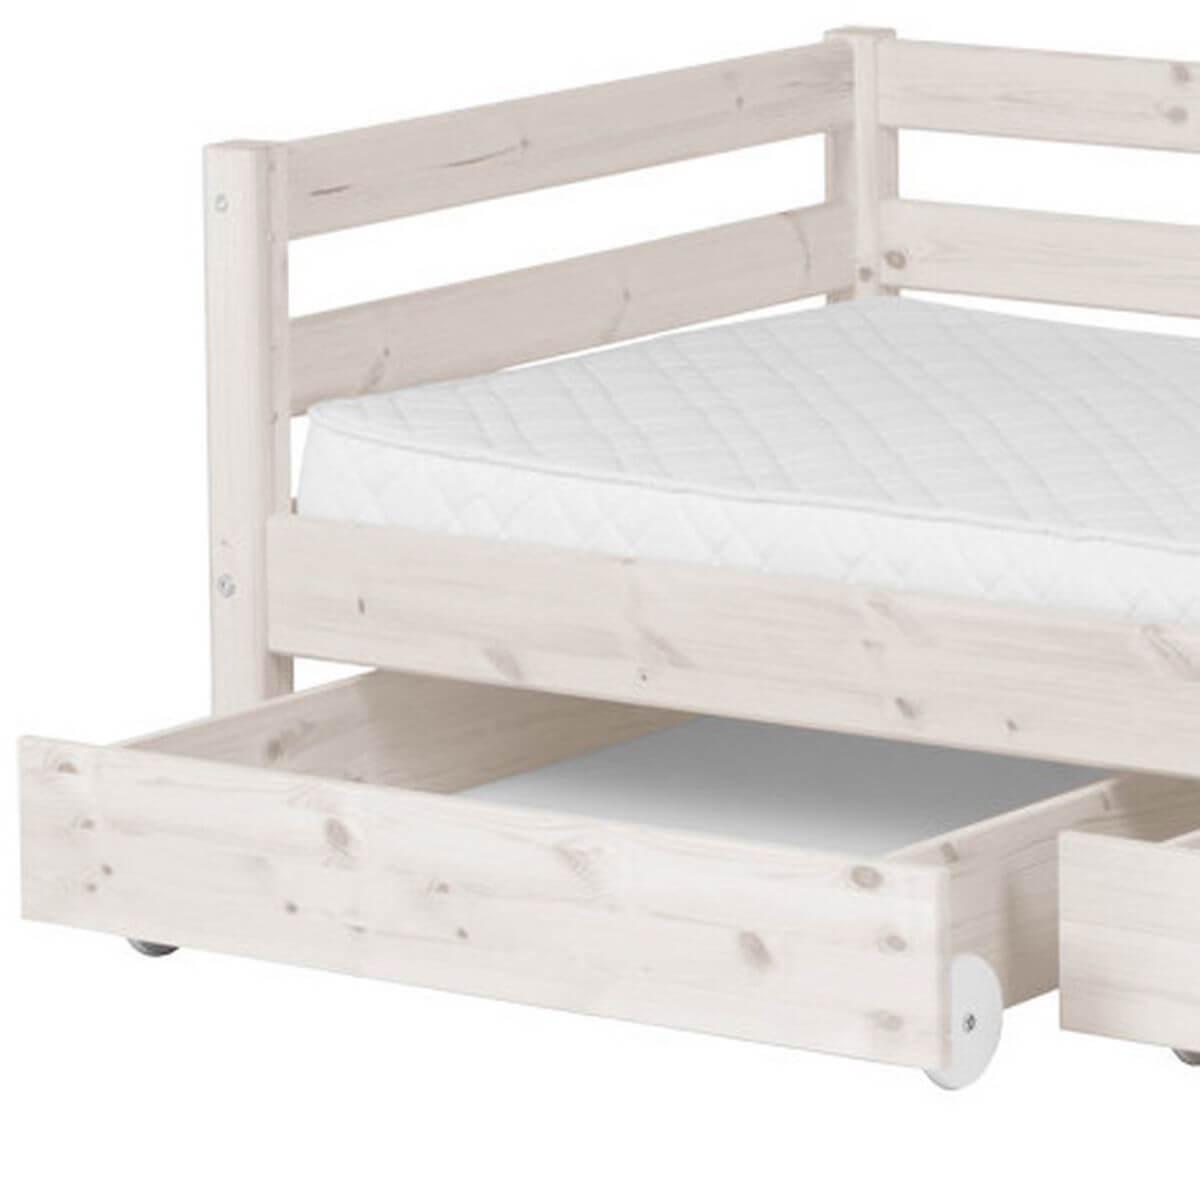 Cama infantil con 2 cajones 90x190 CLASSIC Flexa blanco cal